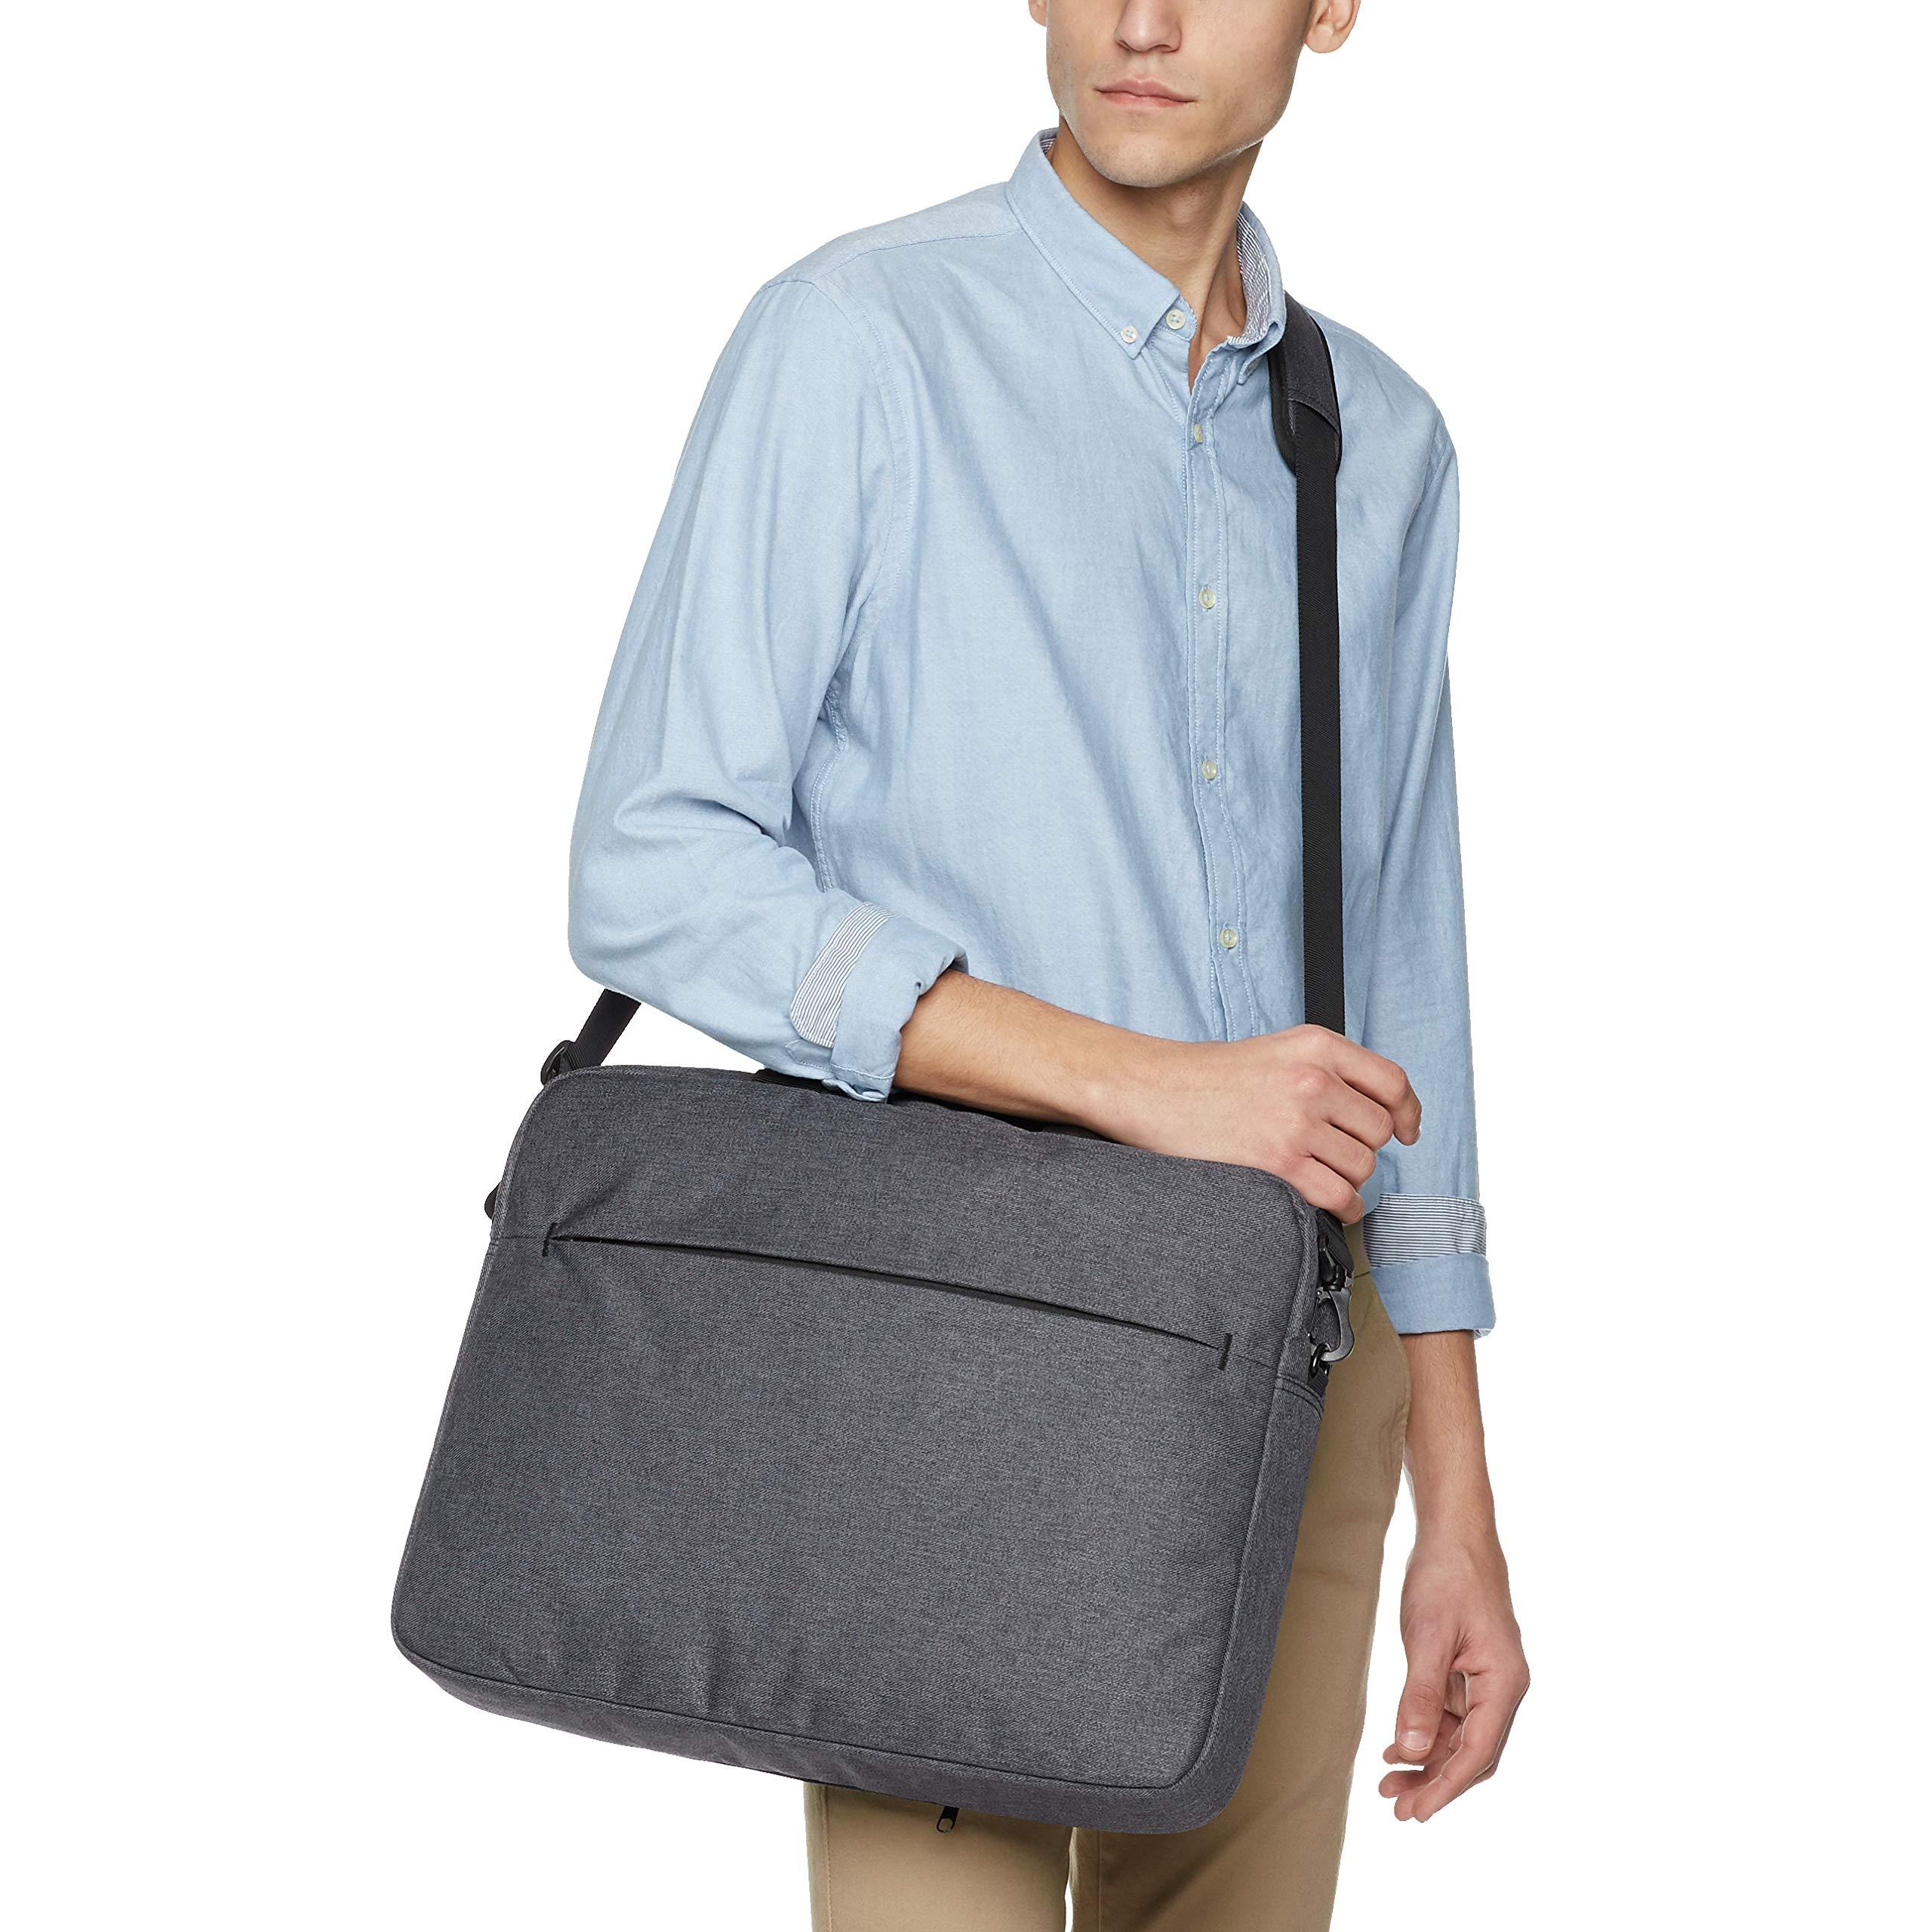 AmazonBasics Urban Laptop and Tablet Case Bag, 17 Inch, Grey by AmazonBasics (Image #8)